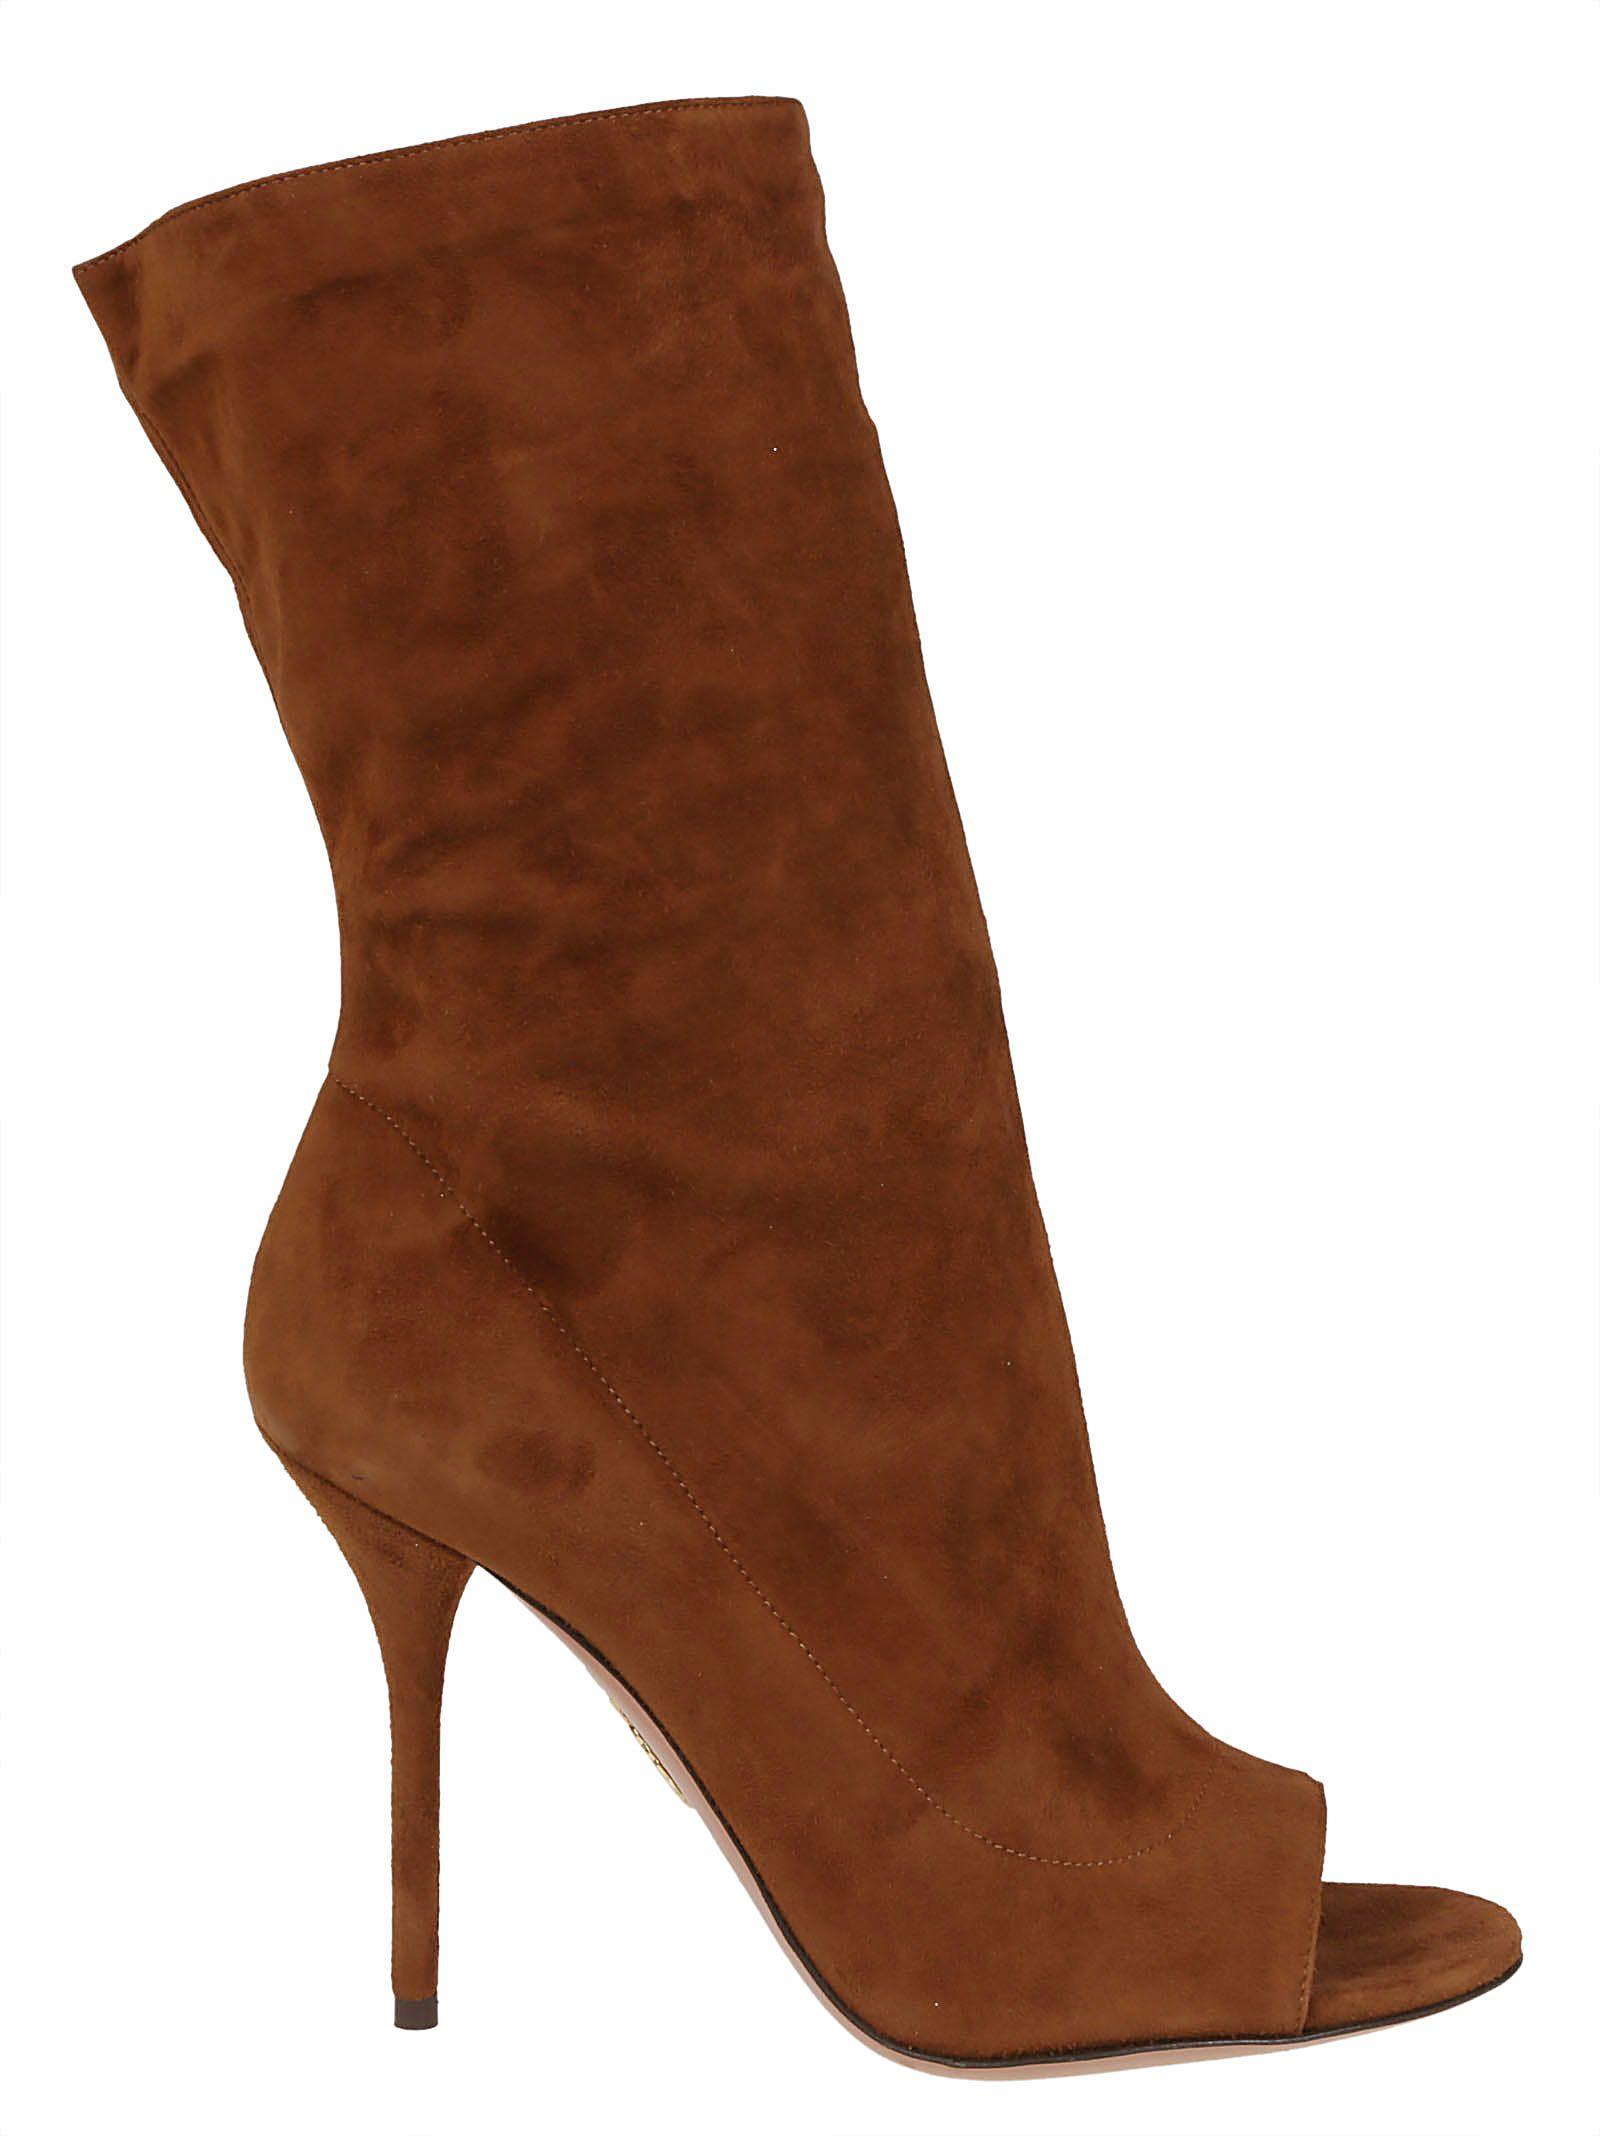 Touche Open Toe Boots, Cinnamon